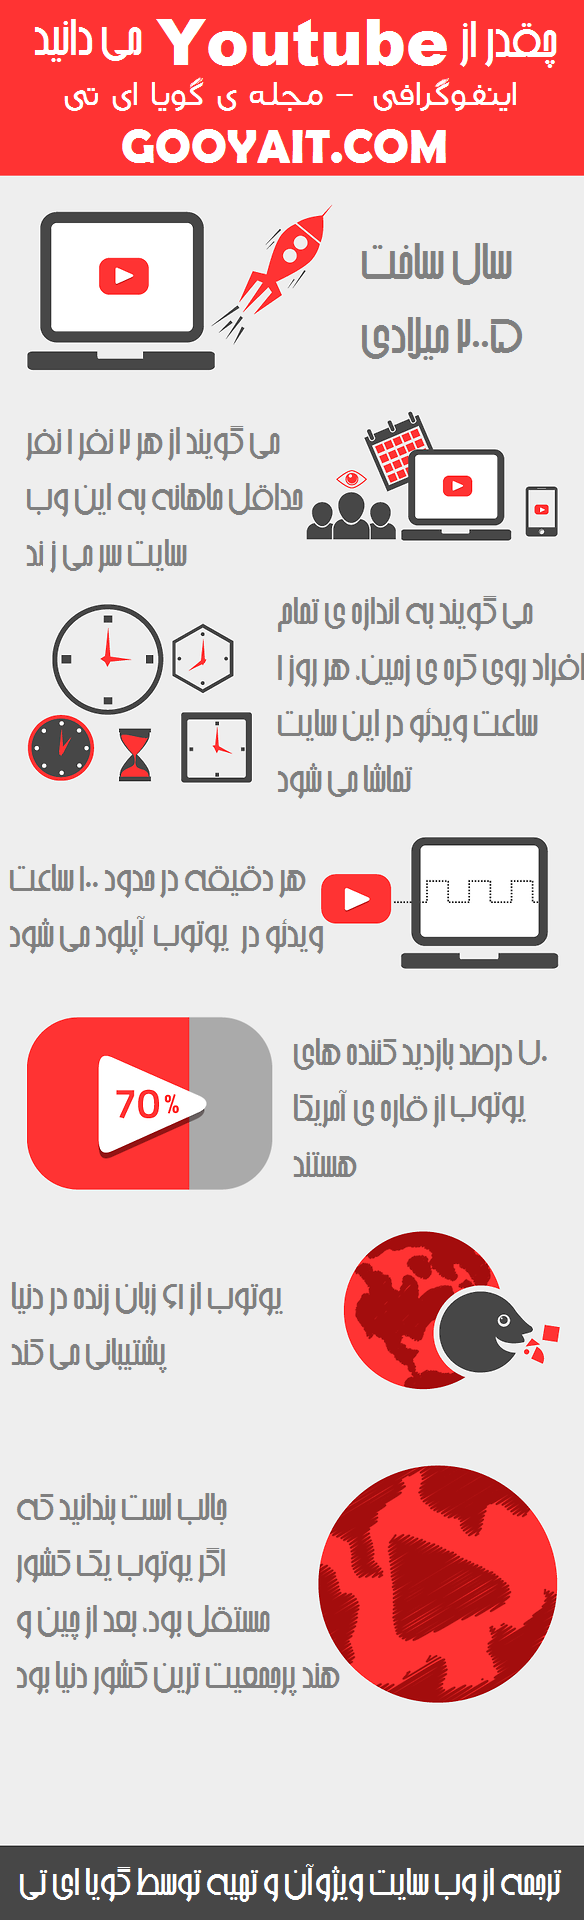 info data